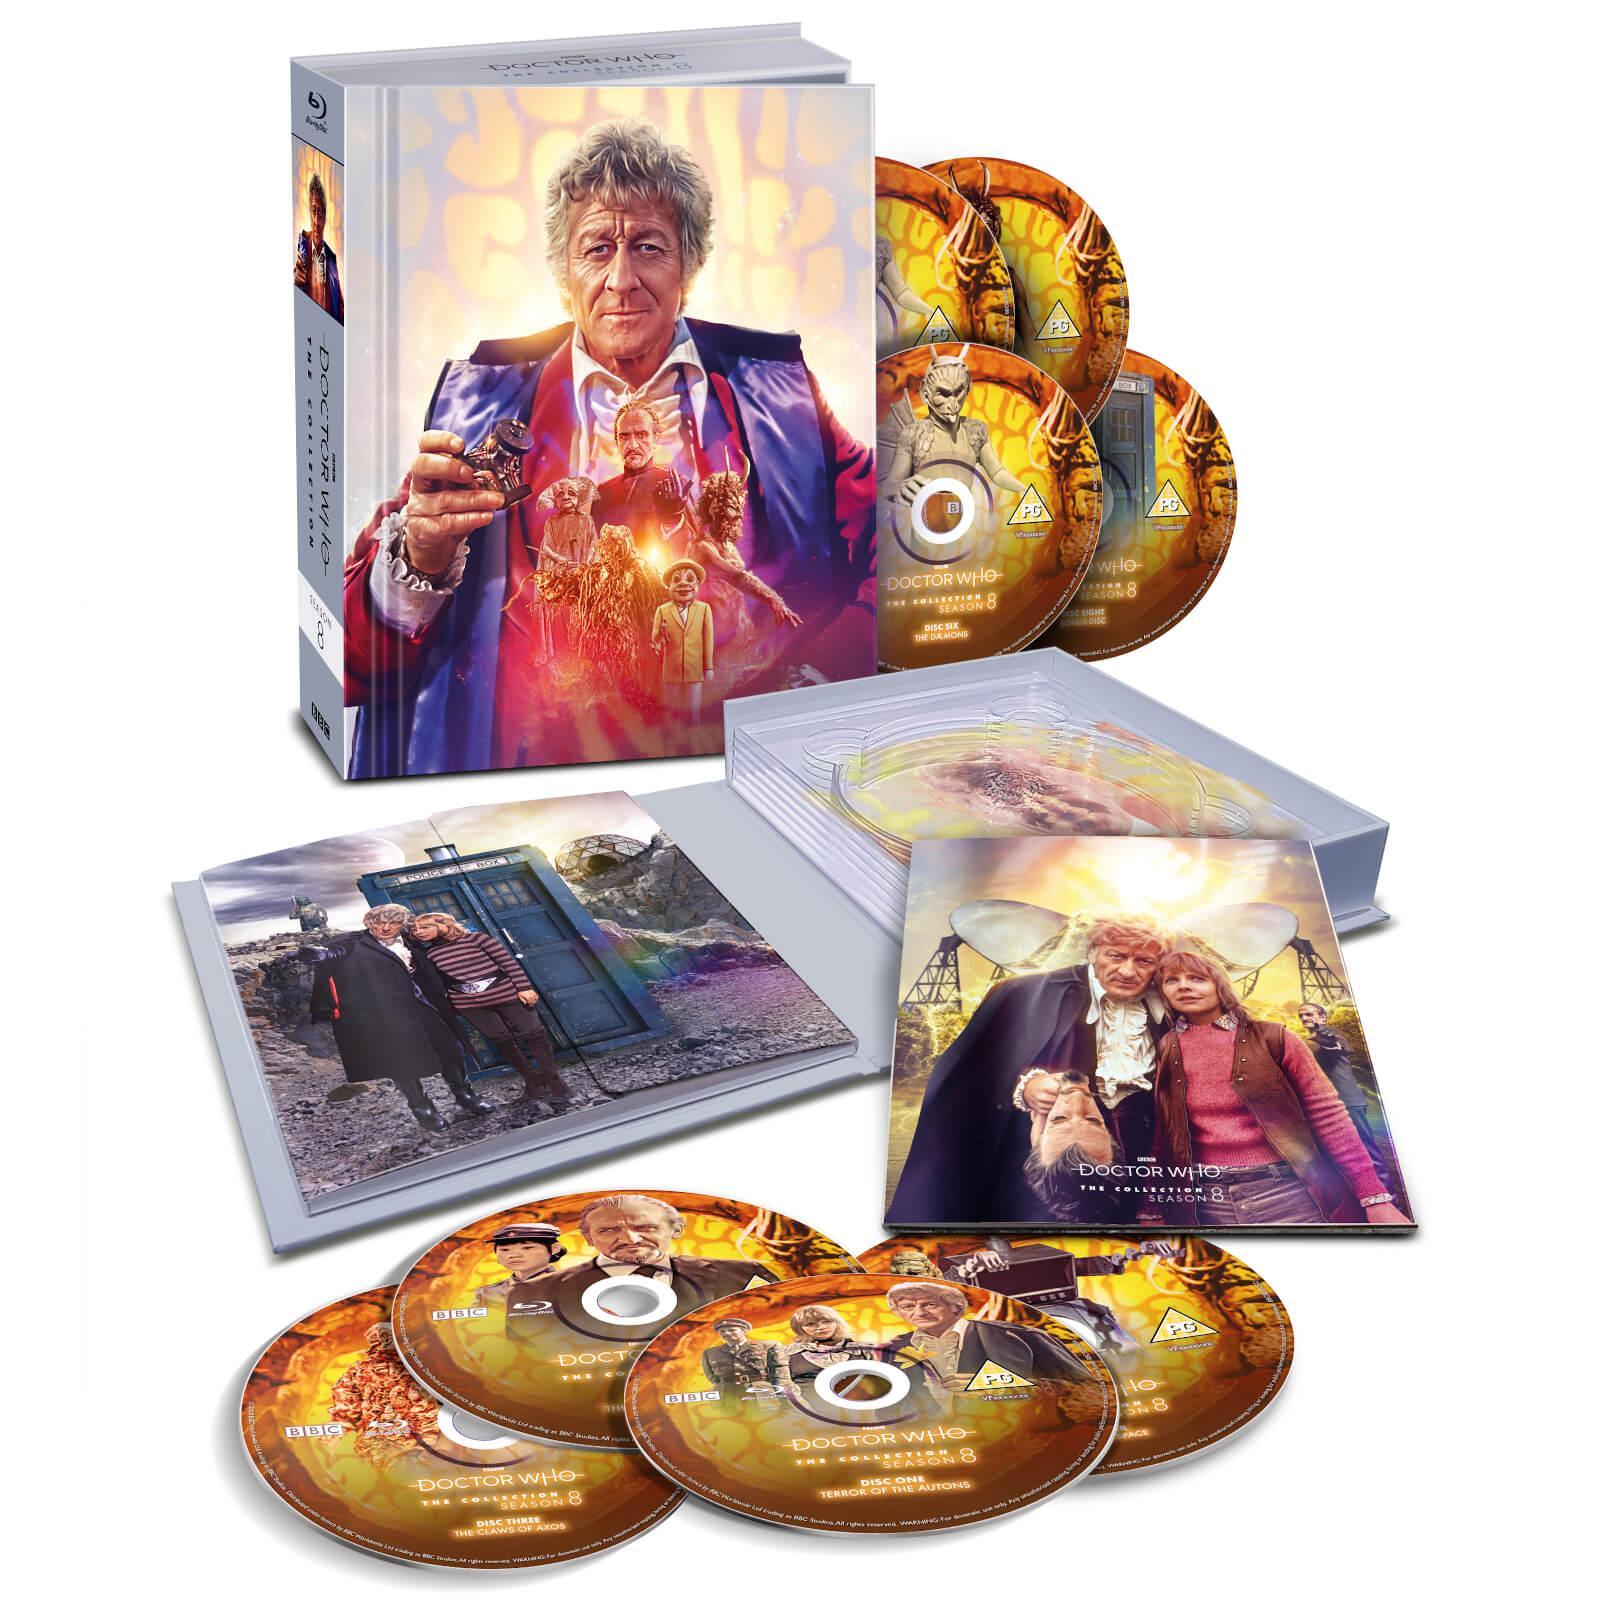 Doctor Who - The Collection - Season 8